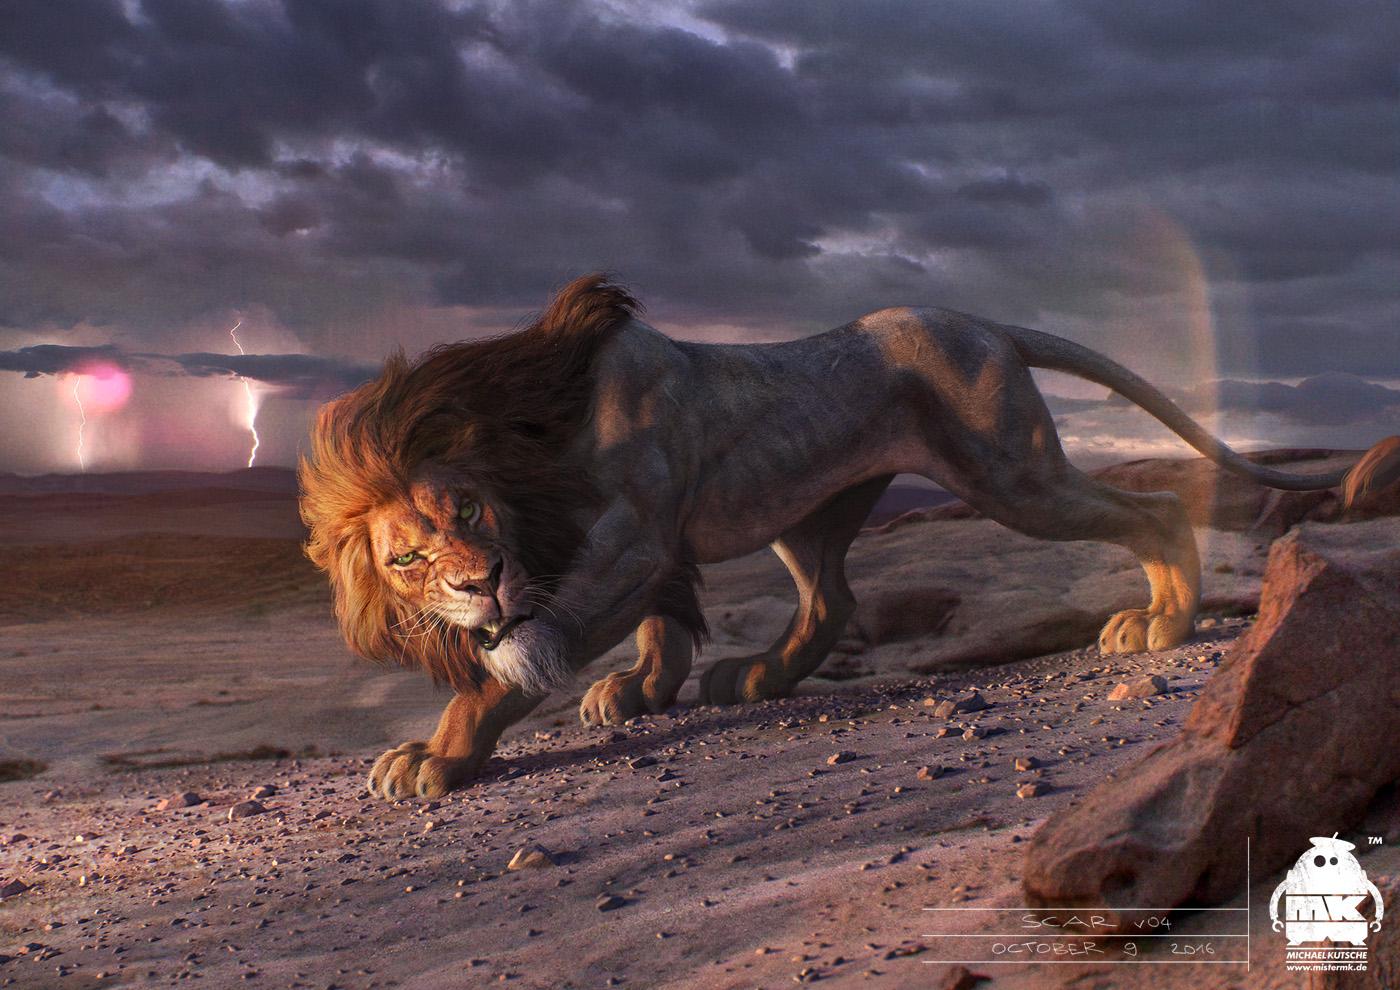 The Lion King Scar Character Design By Michaelkutsche On Deviantart